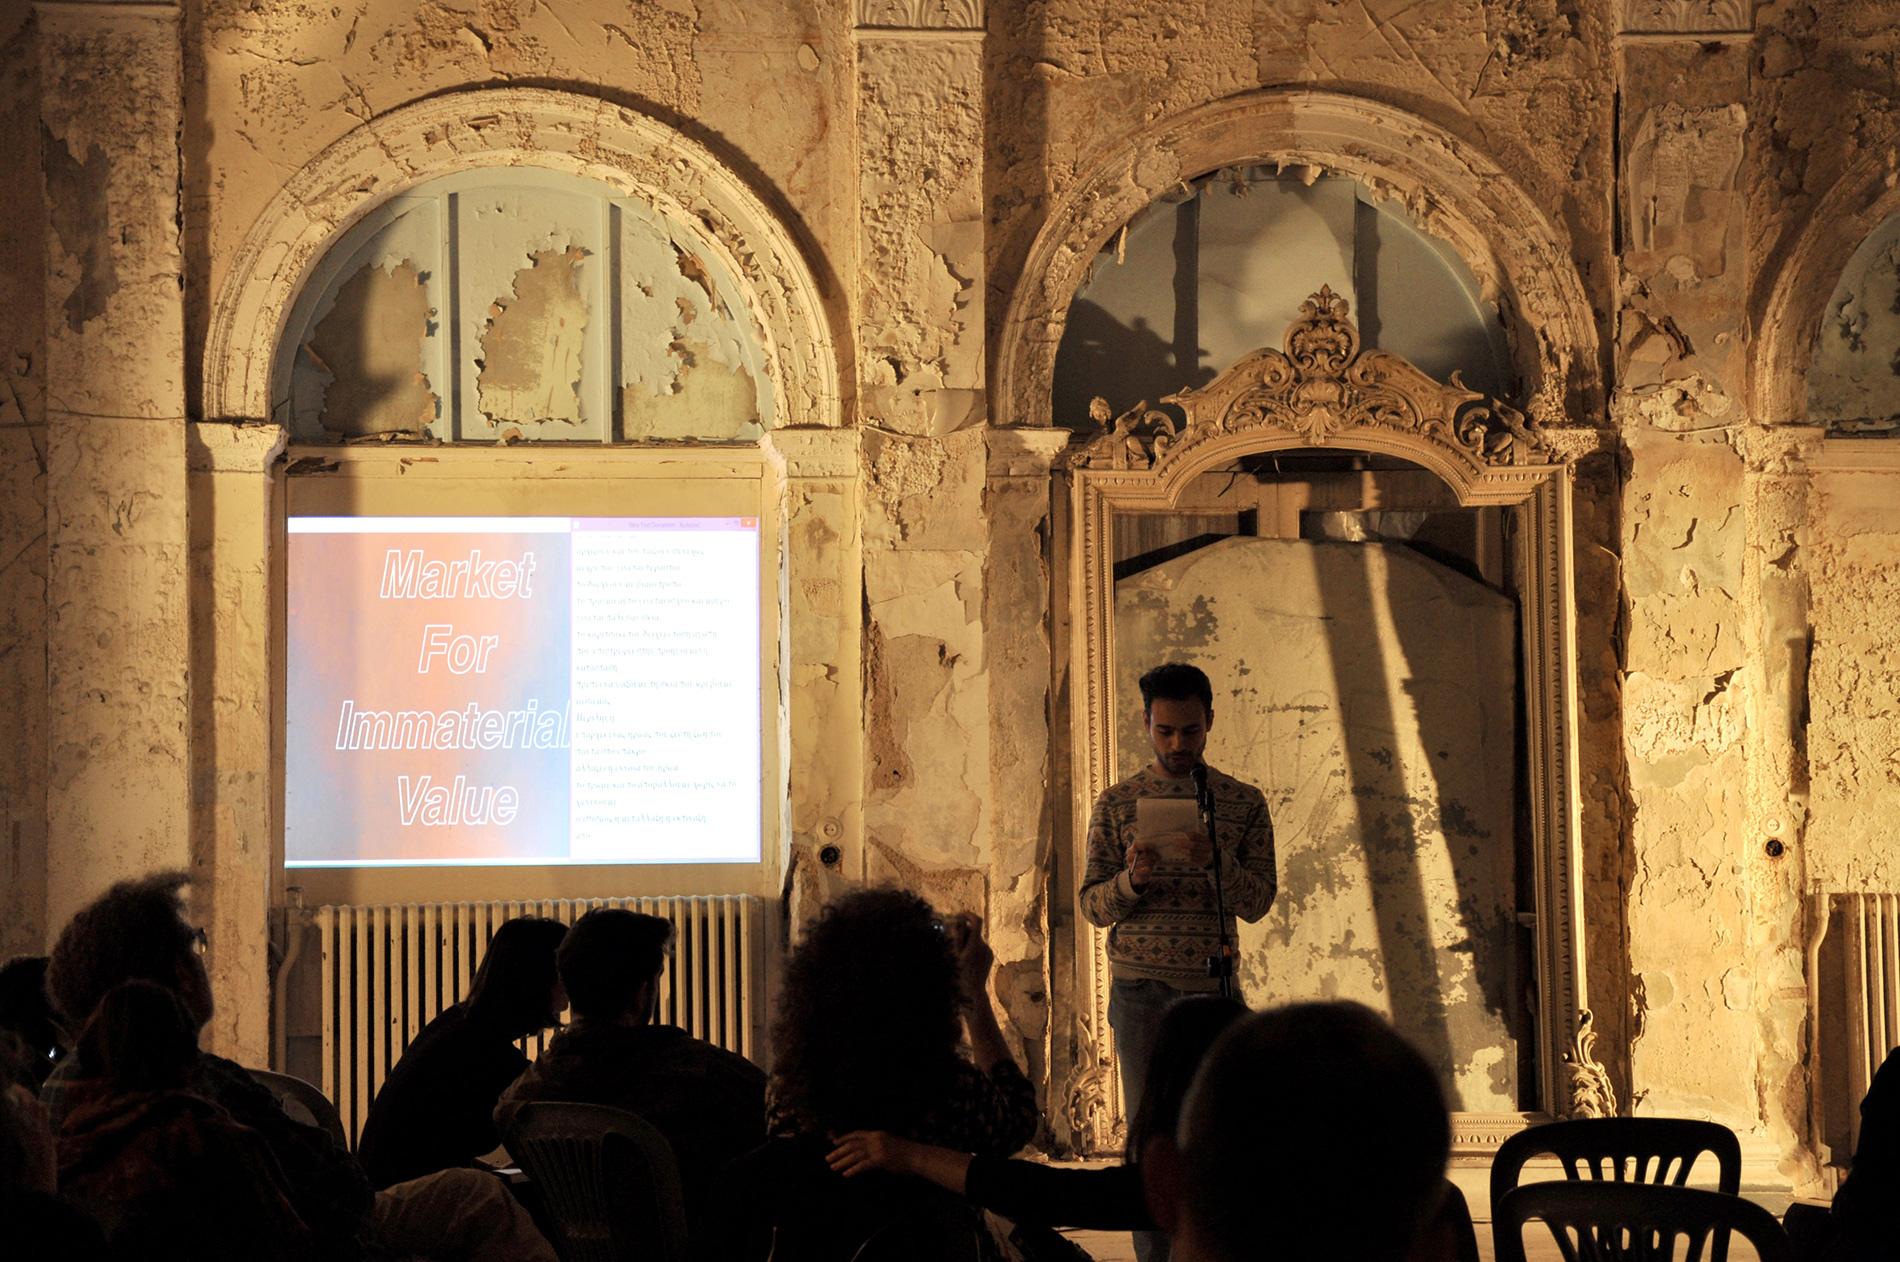 at Athens Biennale 2015 (photo: Natalia Avlona)